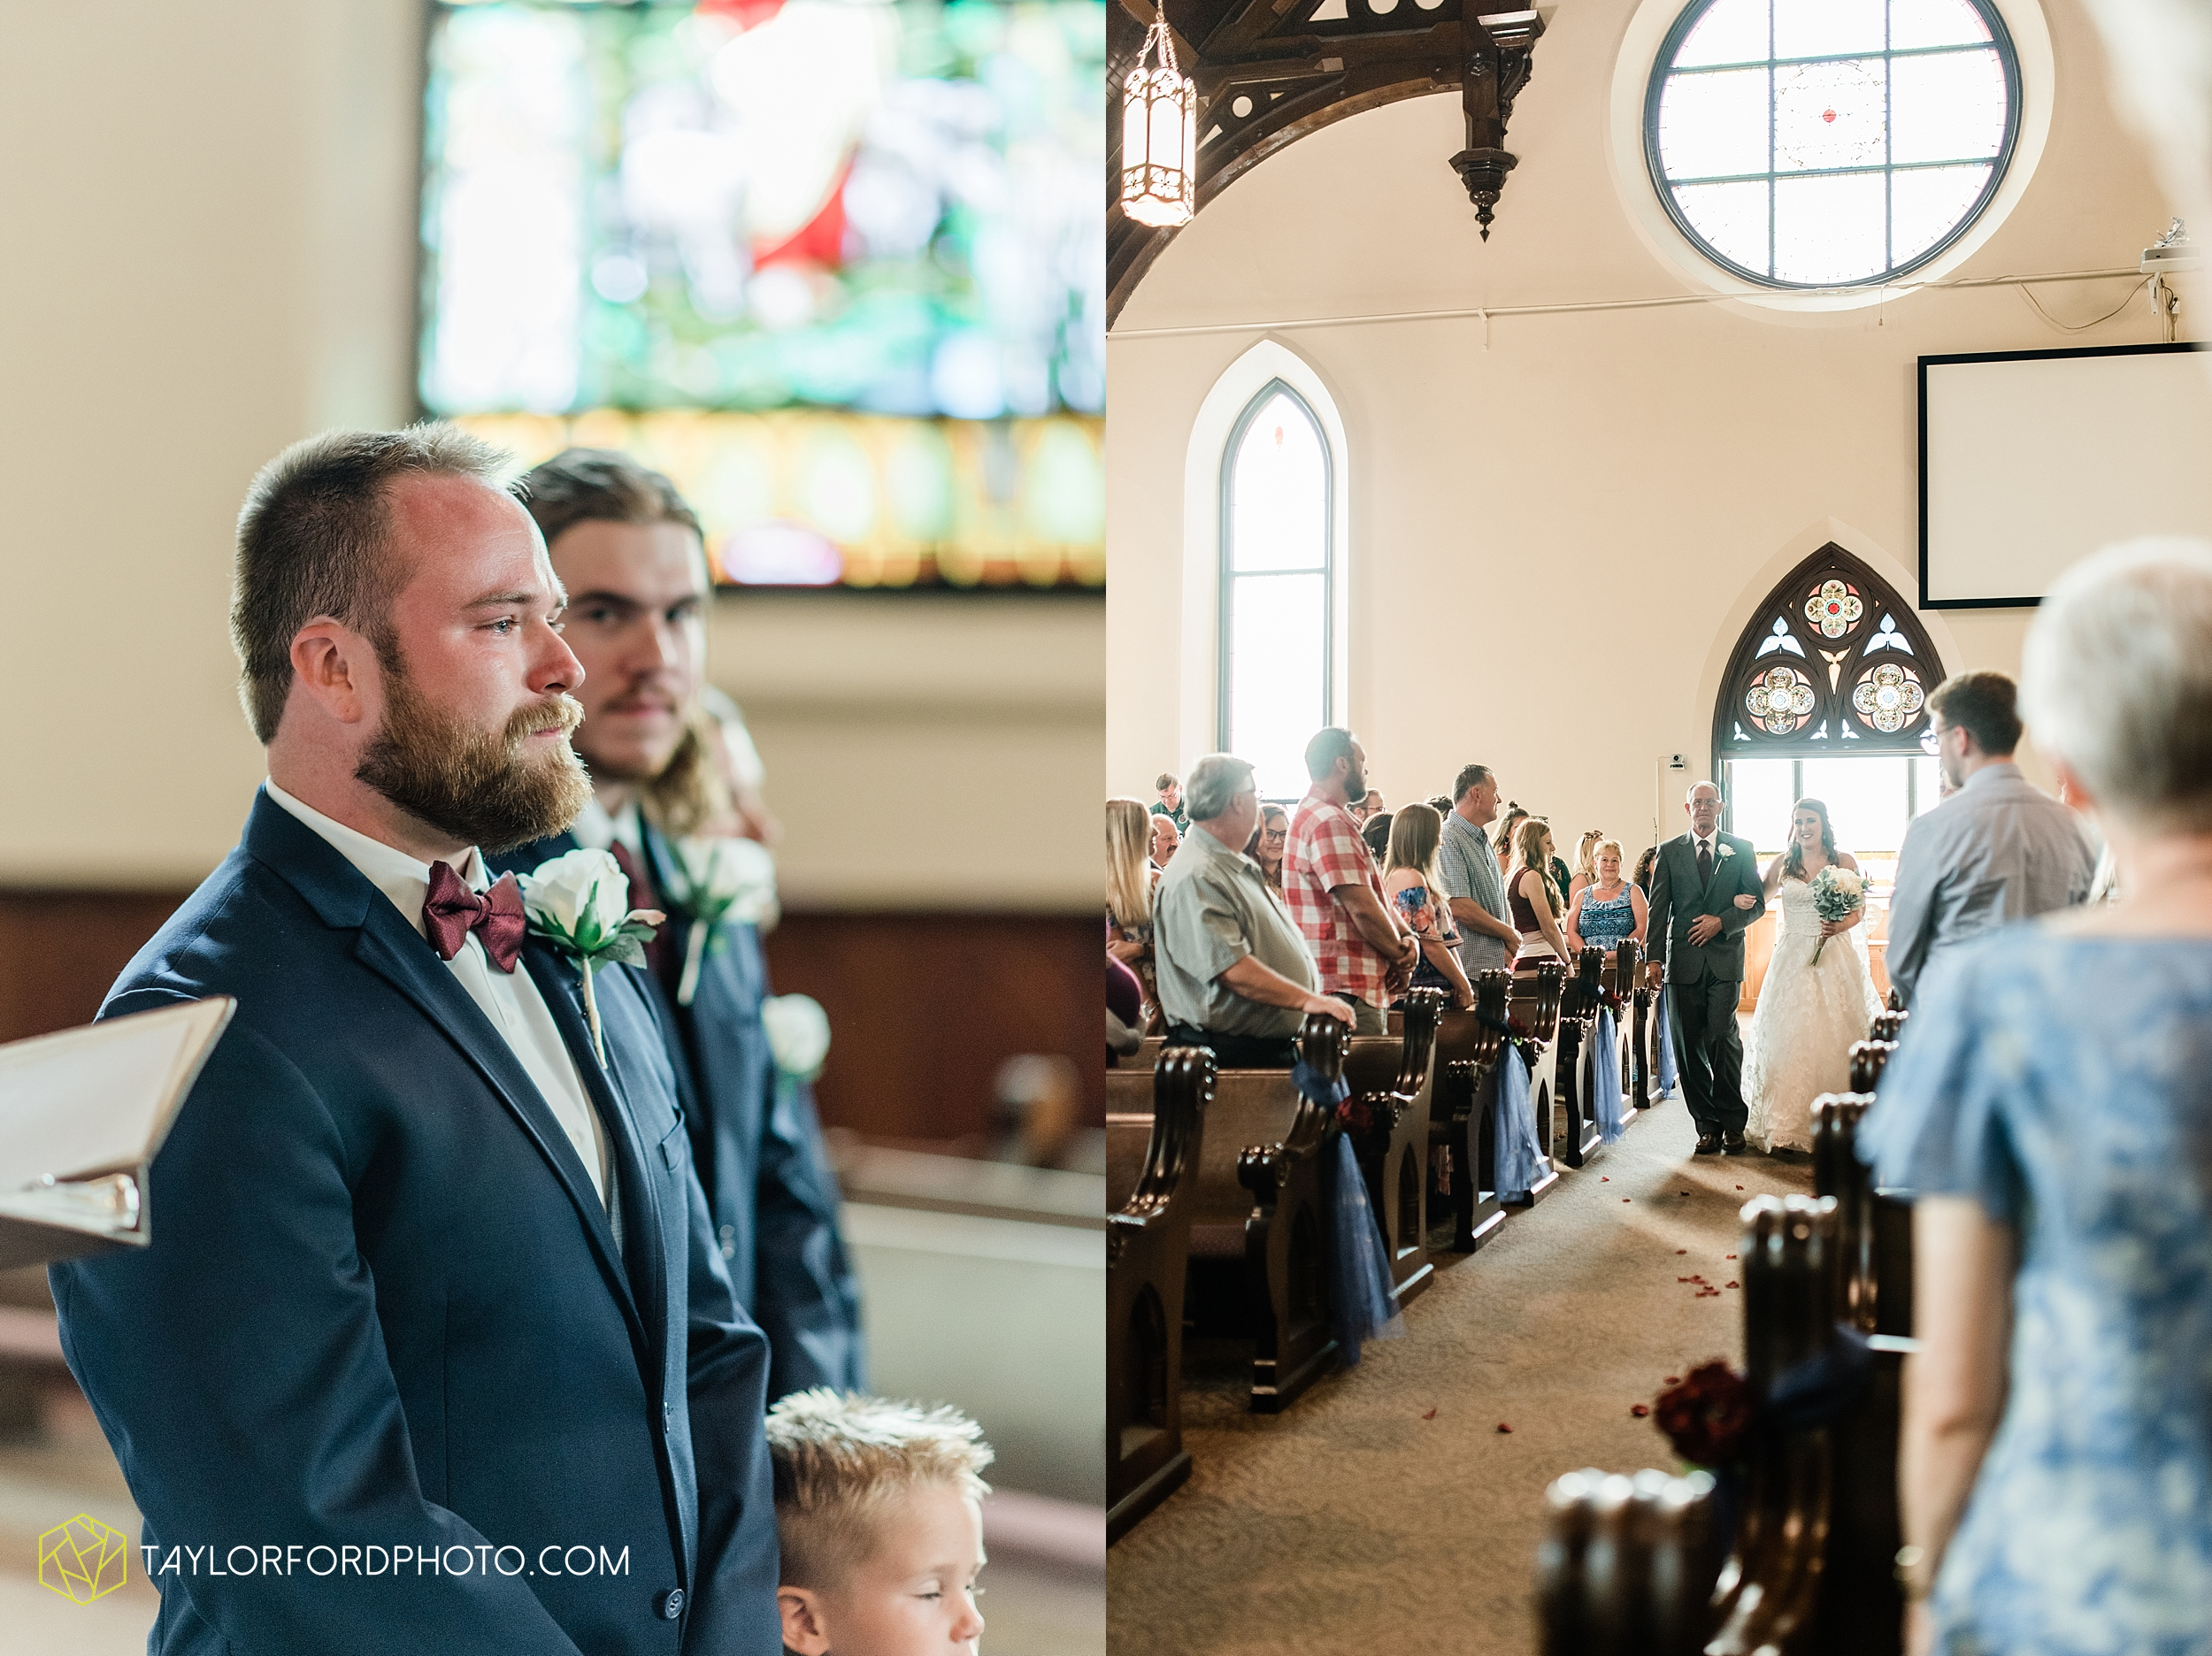 chelsey-zosh-jackson-young-first-united-methodist-church-senior-center-van-wert-ohio-wedding-photographer-taylor-ford-photography_0070.jpg